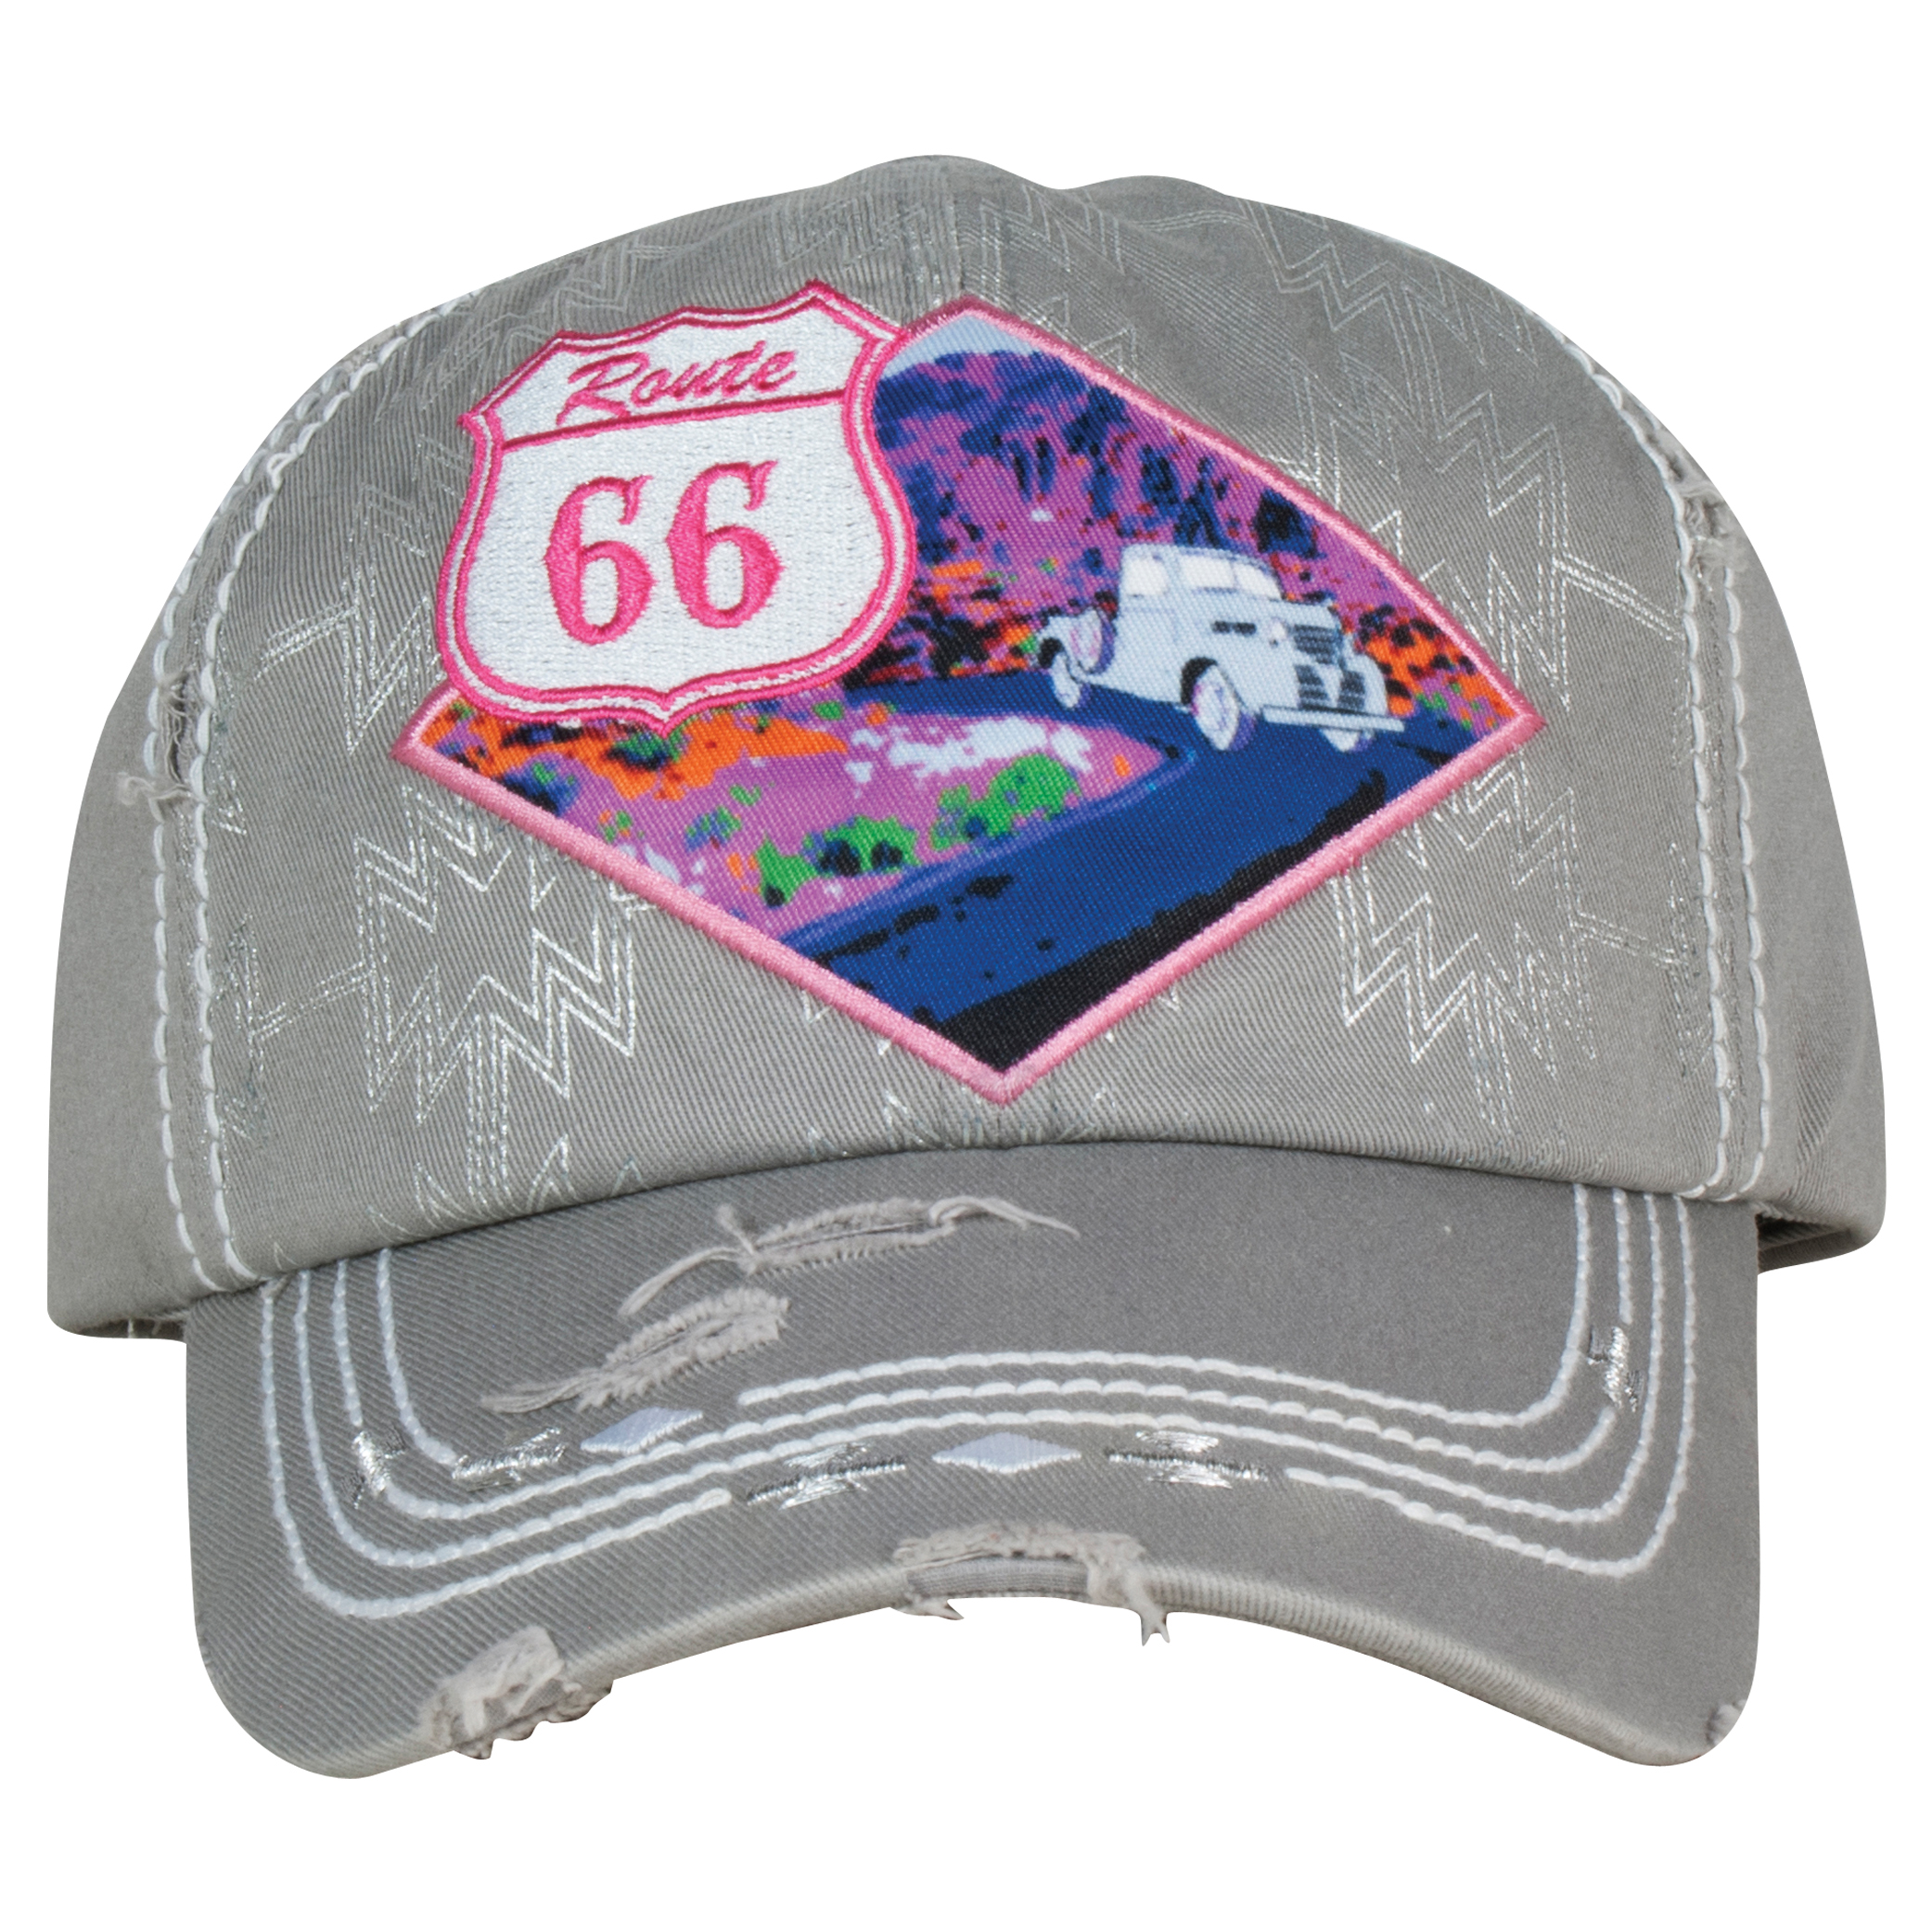 4251f56b385b9 Women s Hats